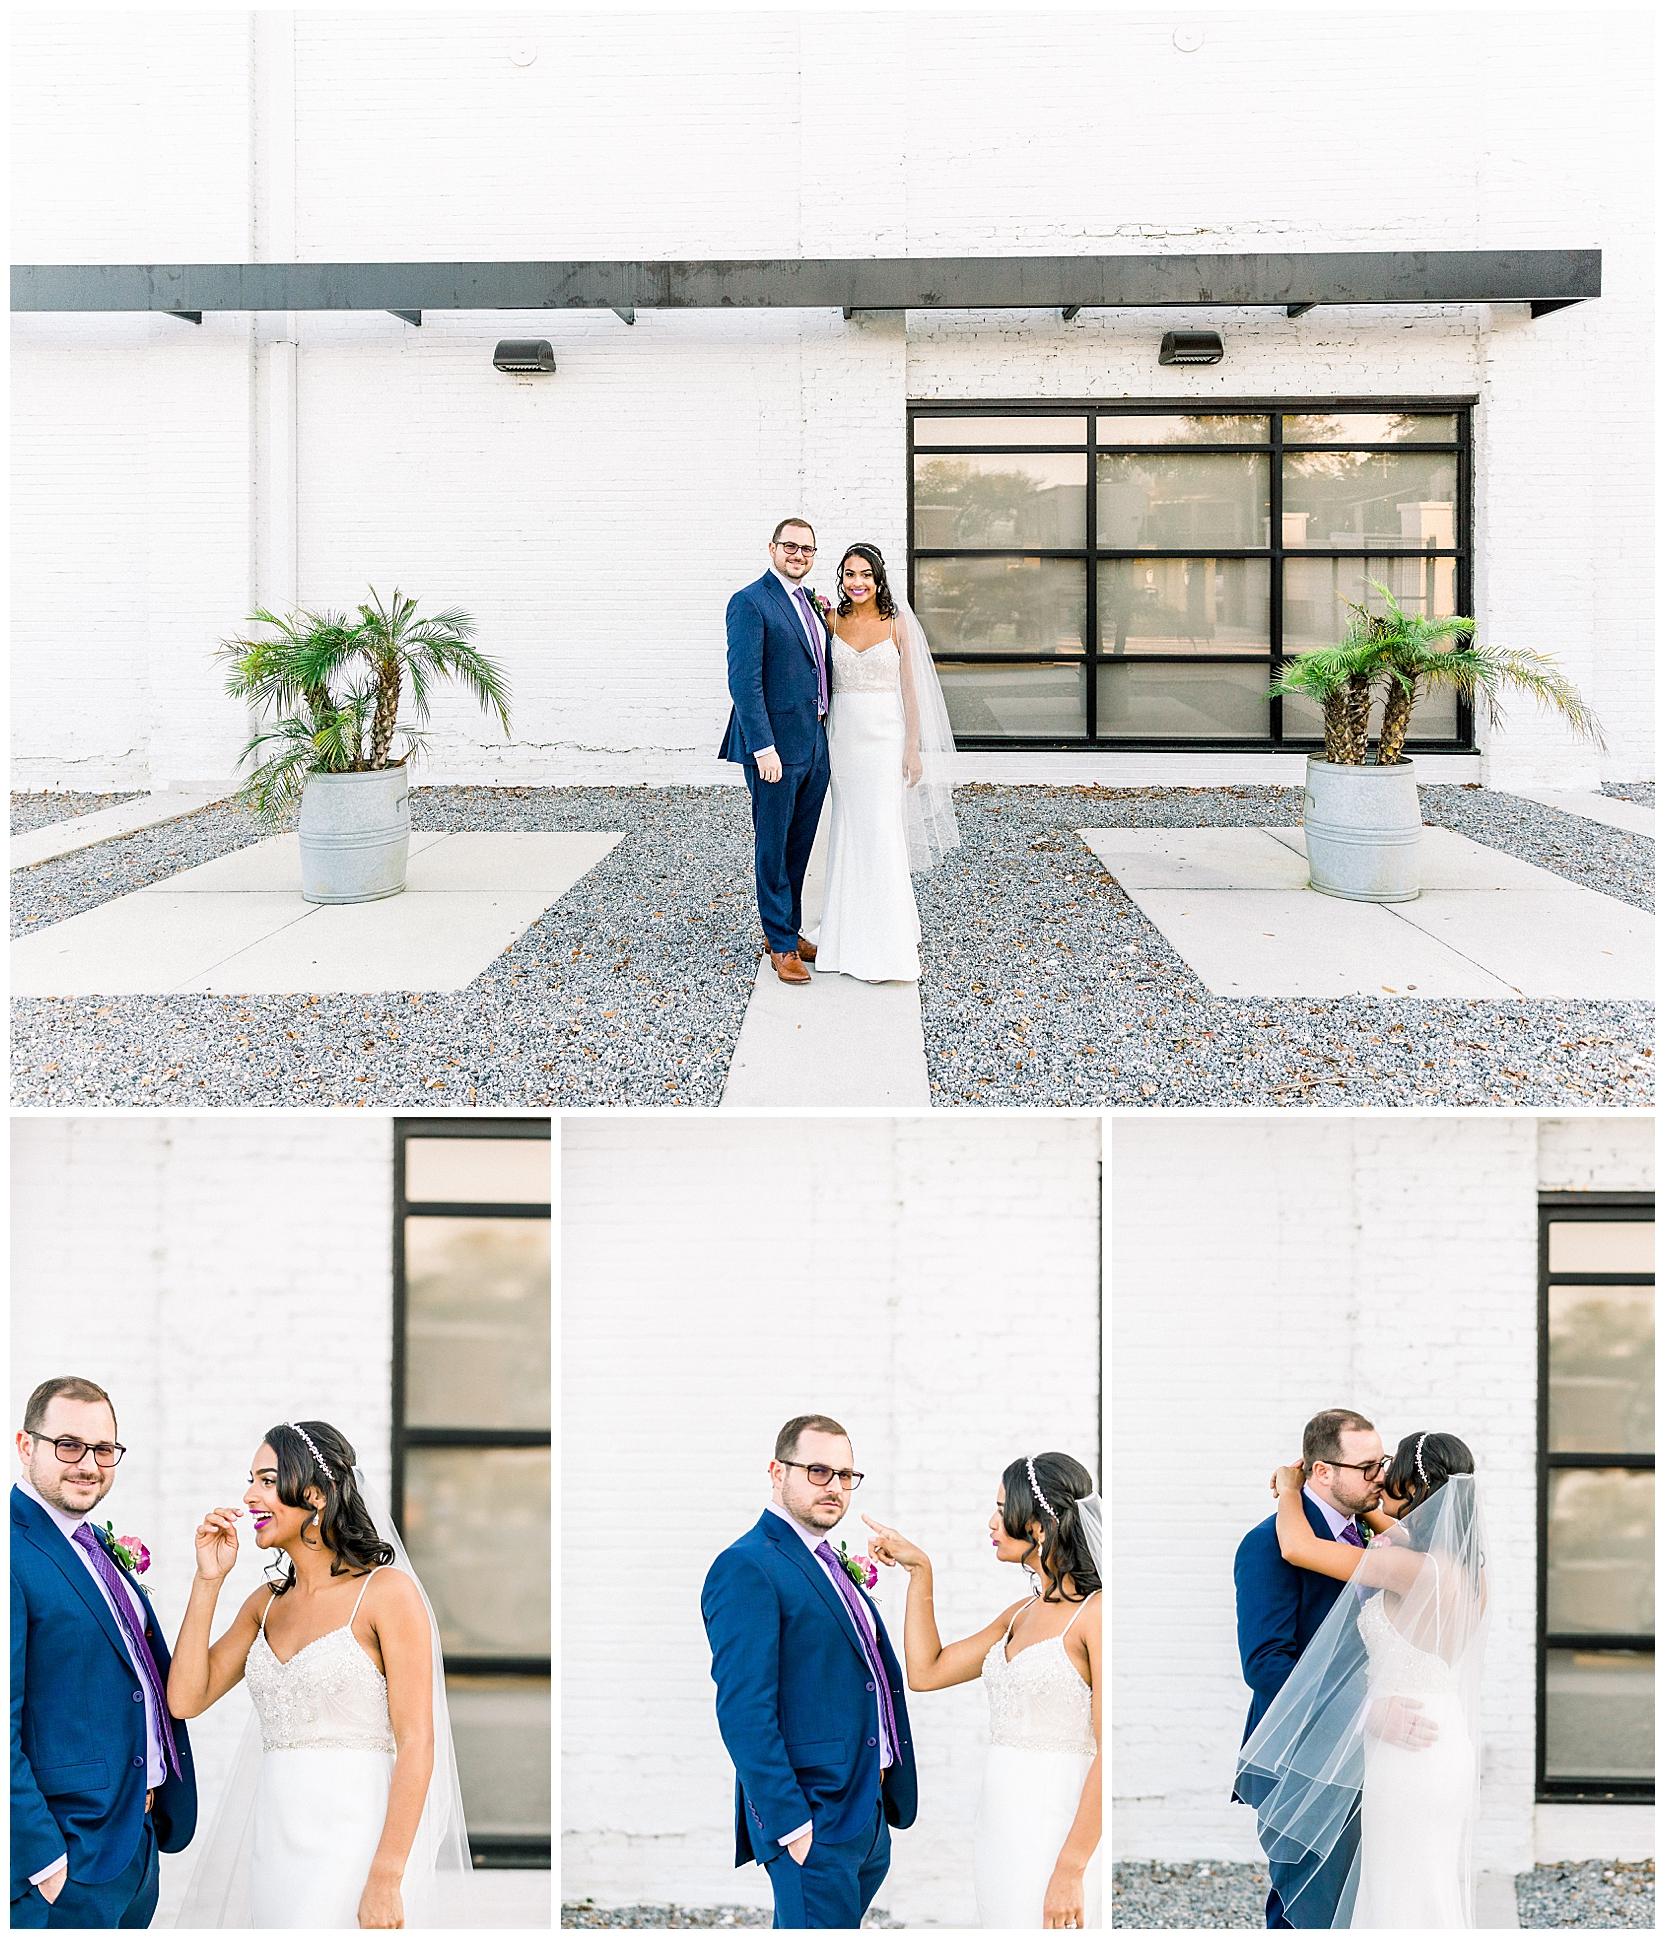 jessicafredericks_lakeland_tampa_wedding_purple_crazy hour_0057.jpg